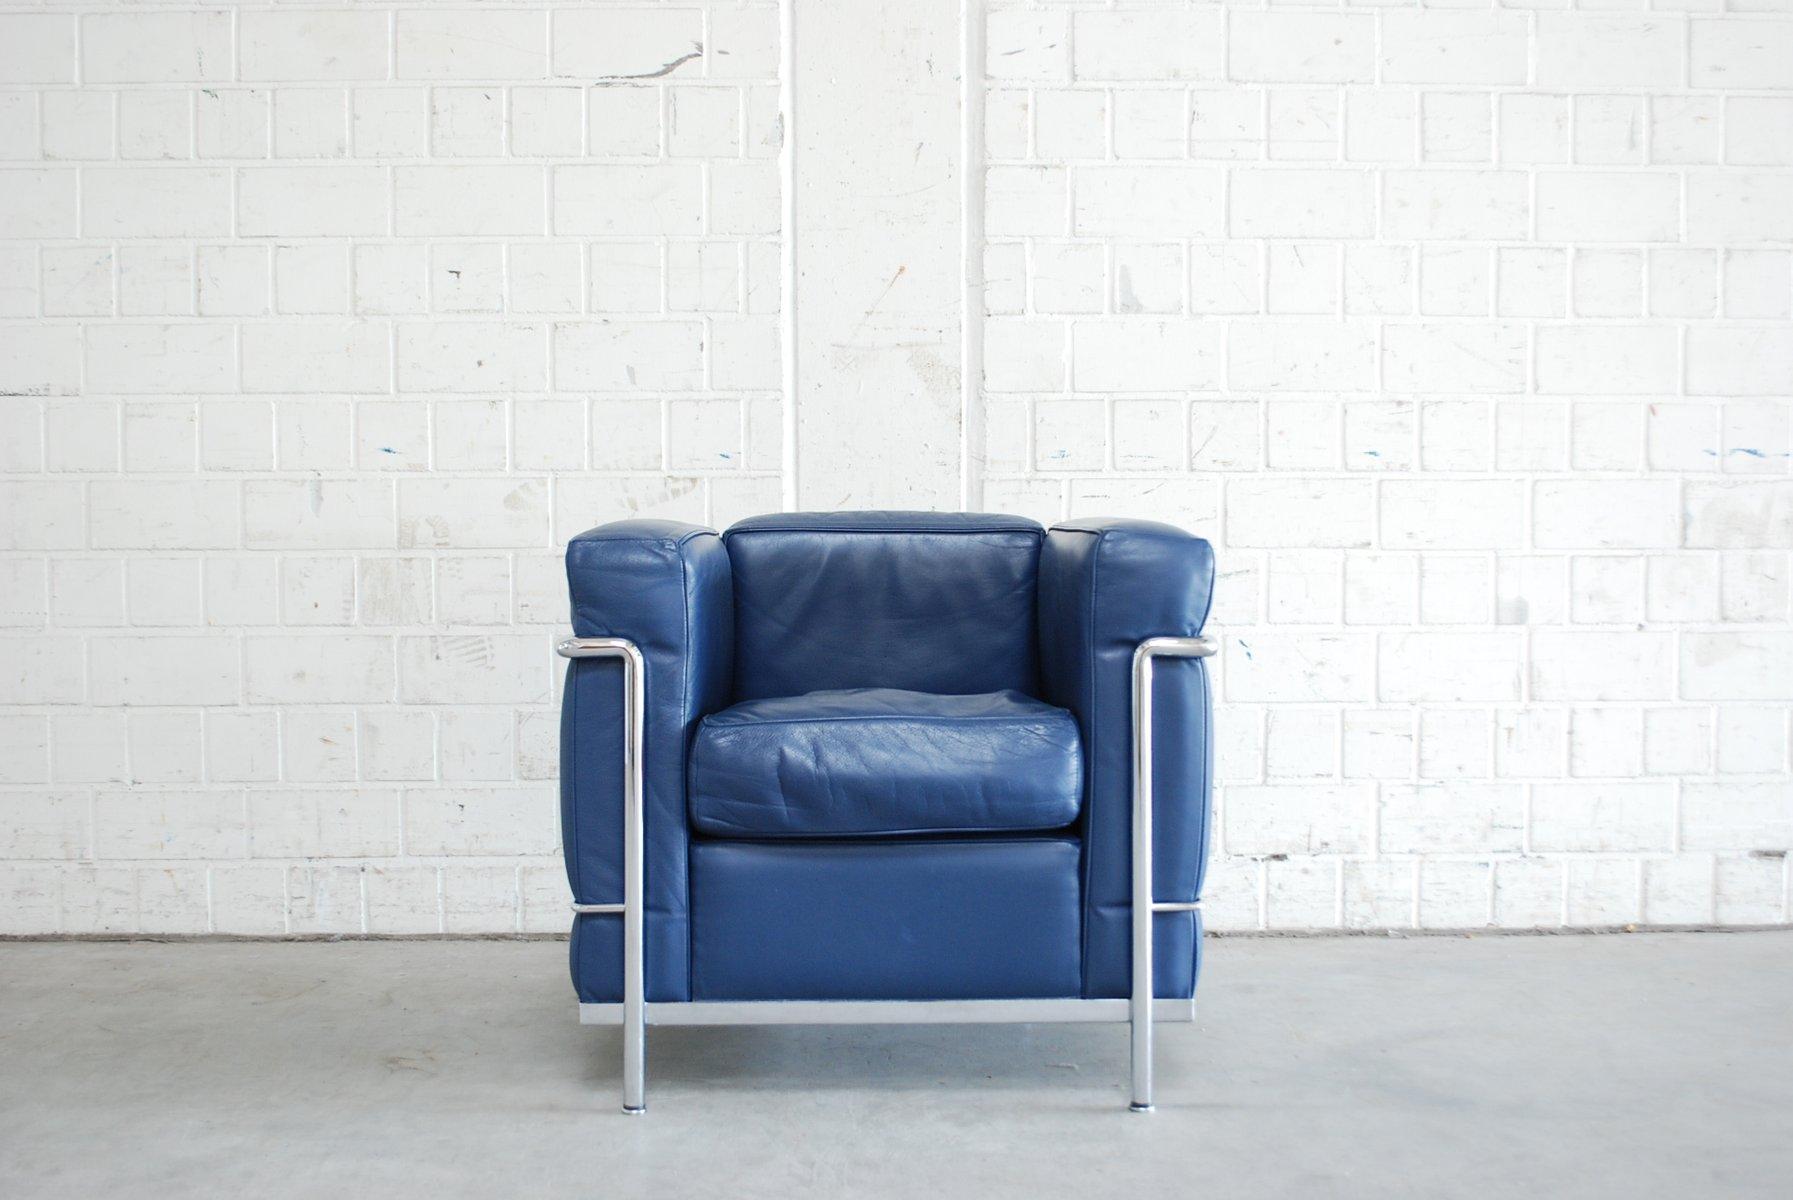 Blauer Vintage Modell LC2 Ledersessel von Le Corbusier für Cassina ...